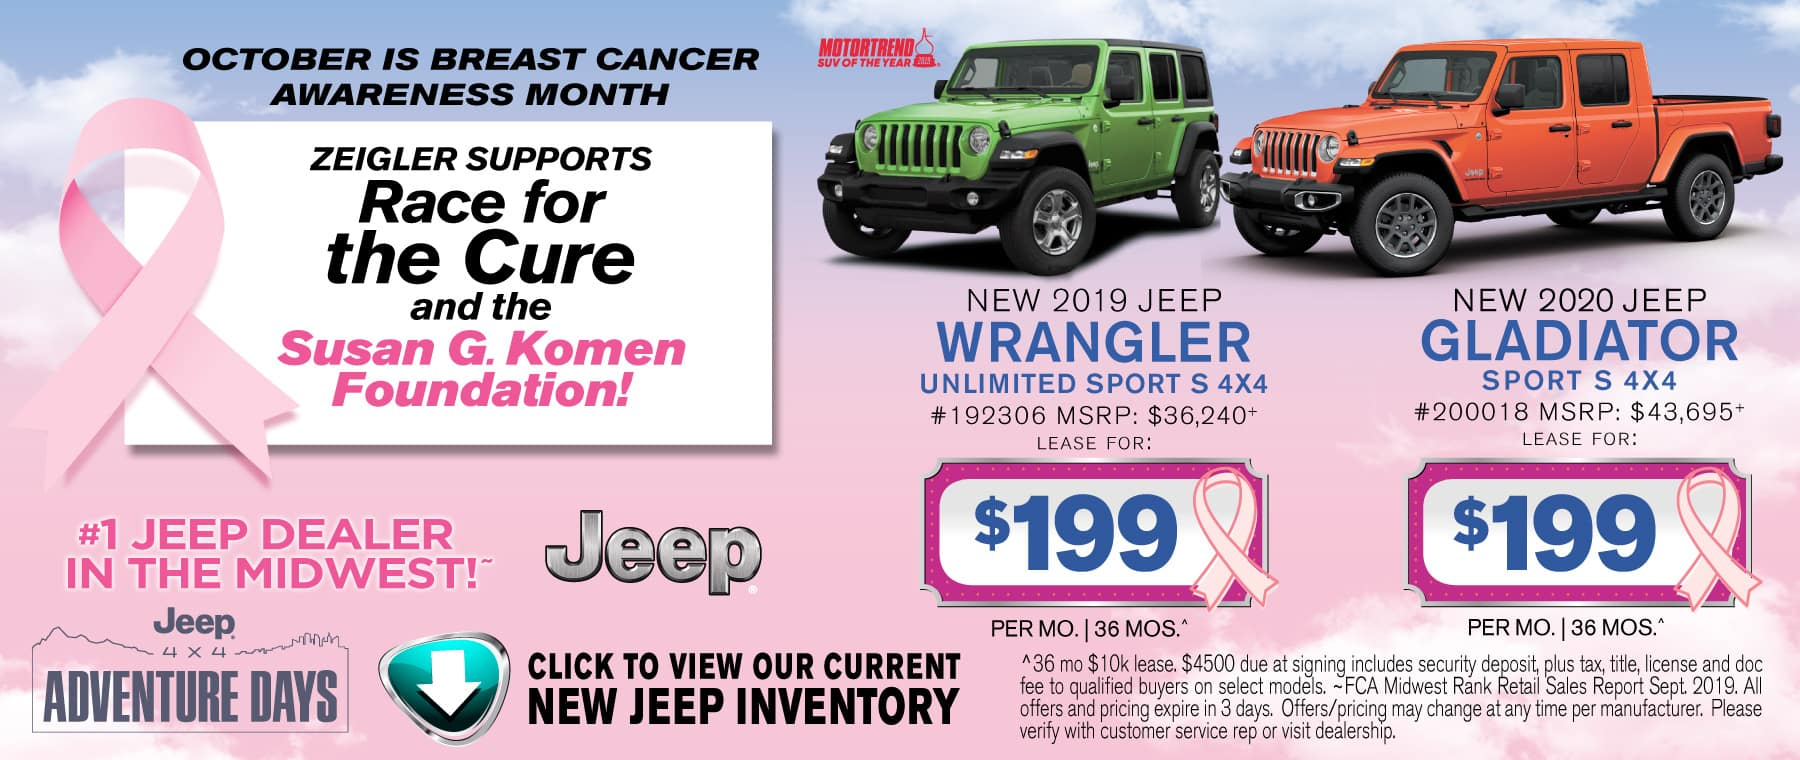 Breast Cancer Wrangler Gladiator